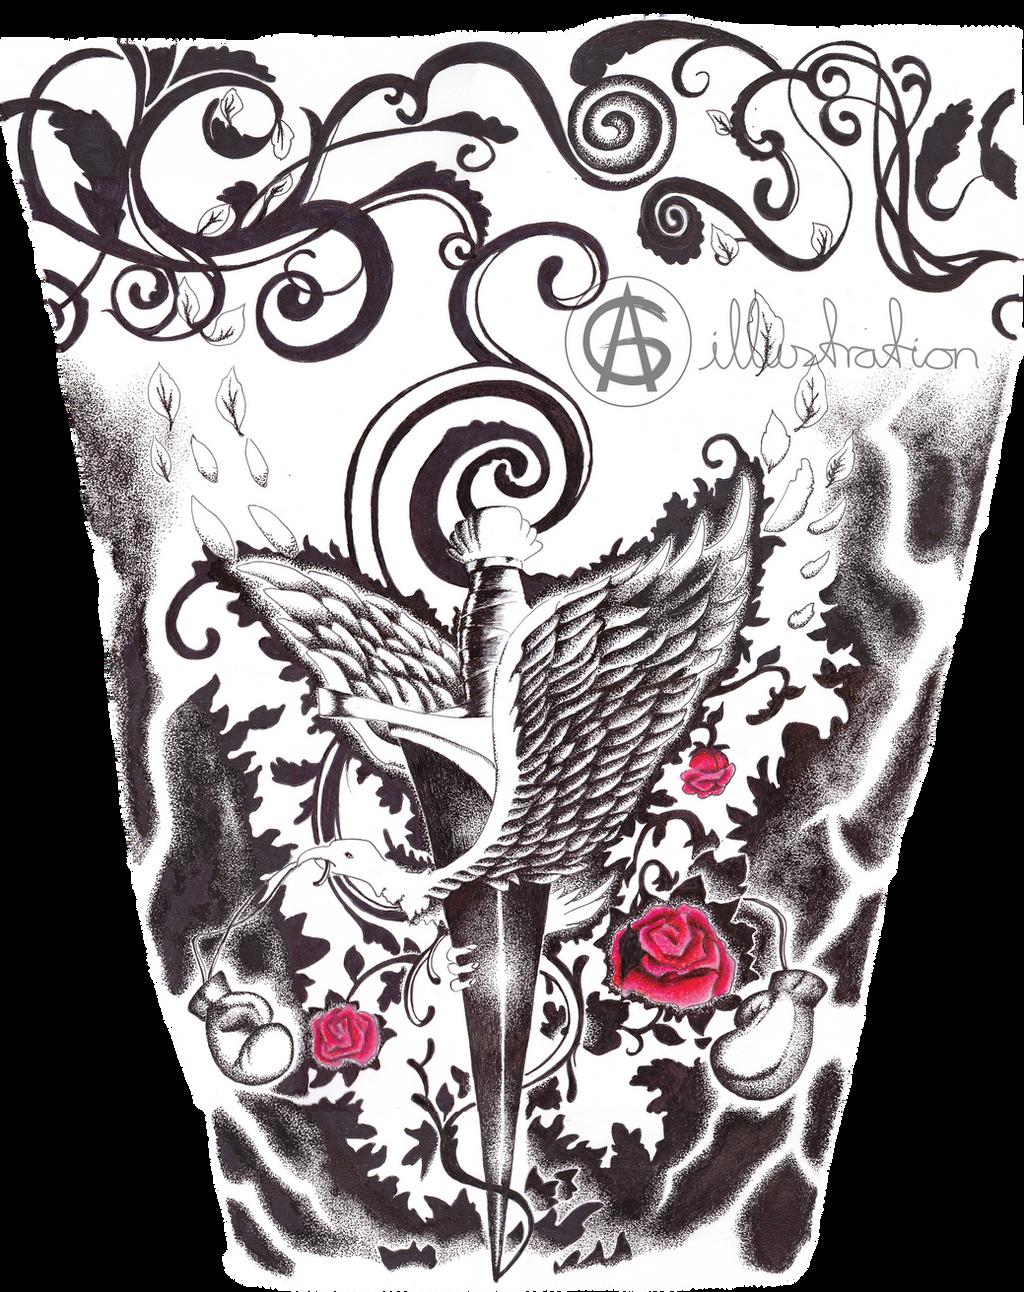 Arm Tattoo Png Maori: Arm Tattoo Commission By AG-sArt On DeviantArt